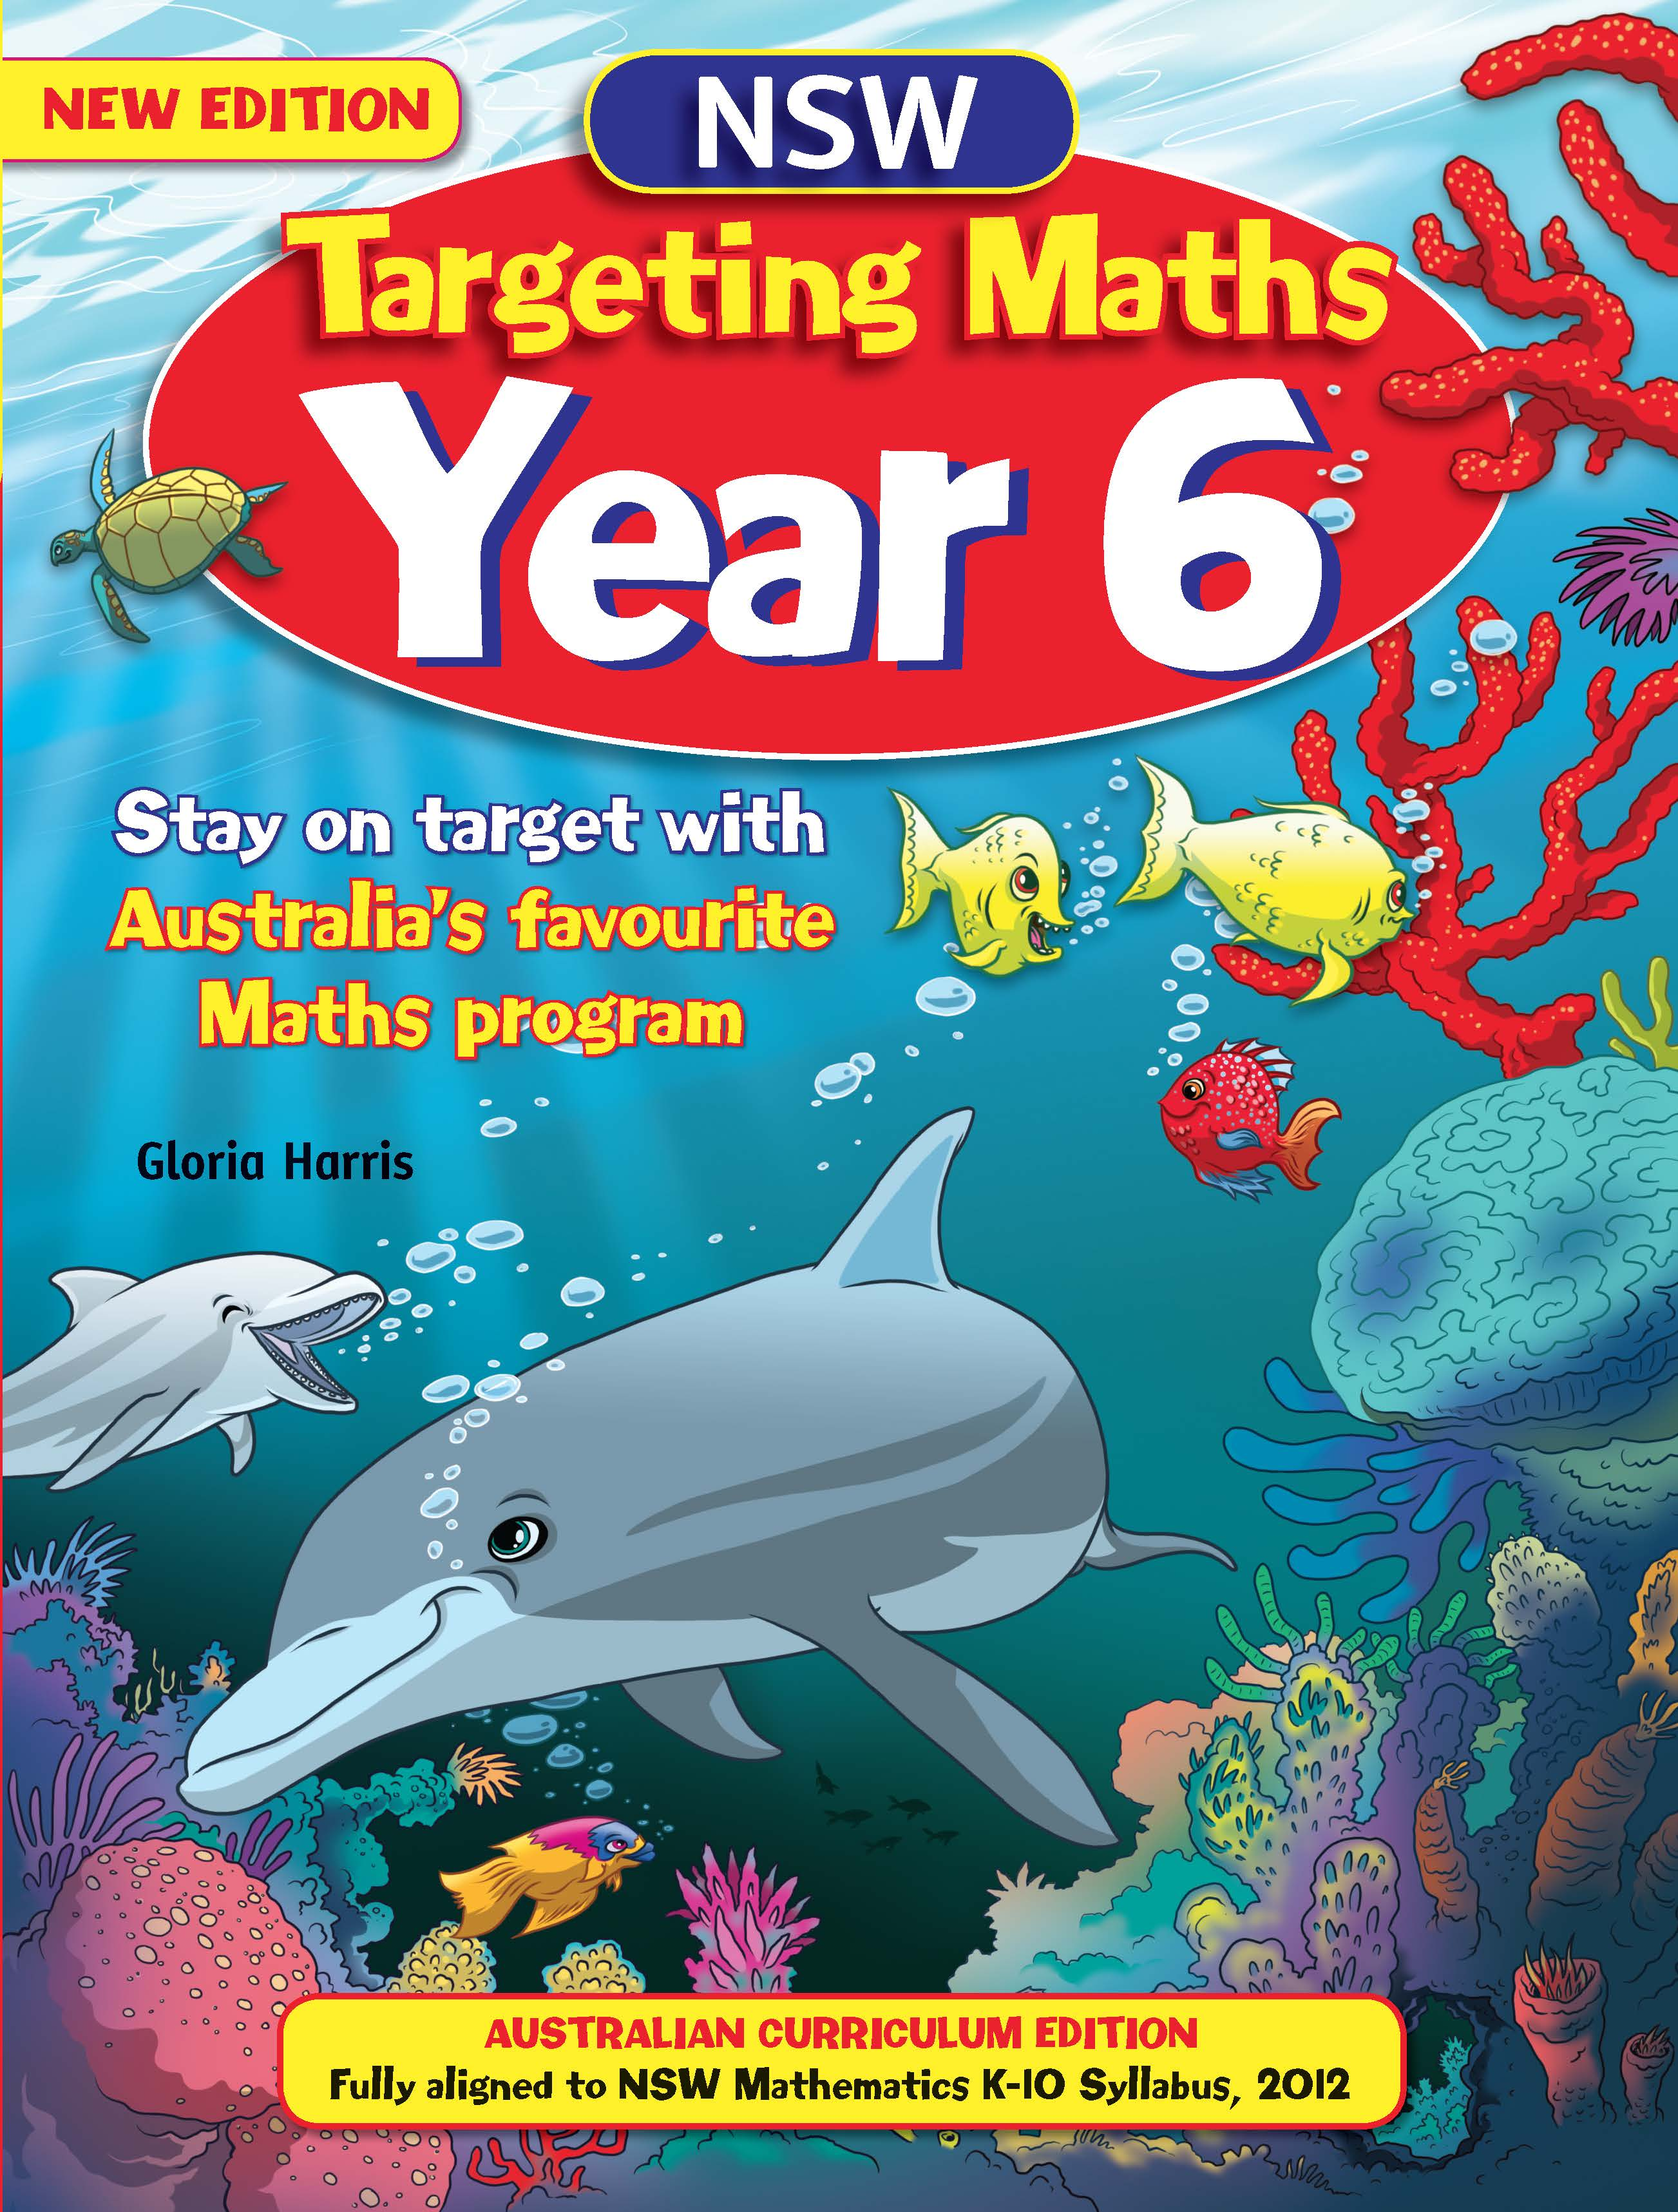 NSW Targeting Maths Australian Curriculum Edition Student Book Year 6